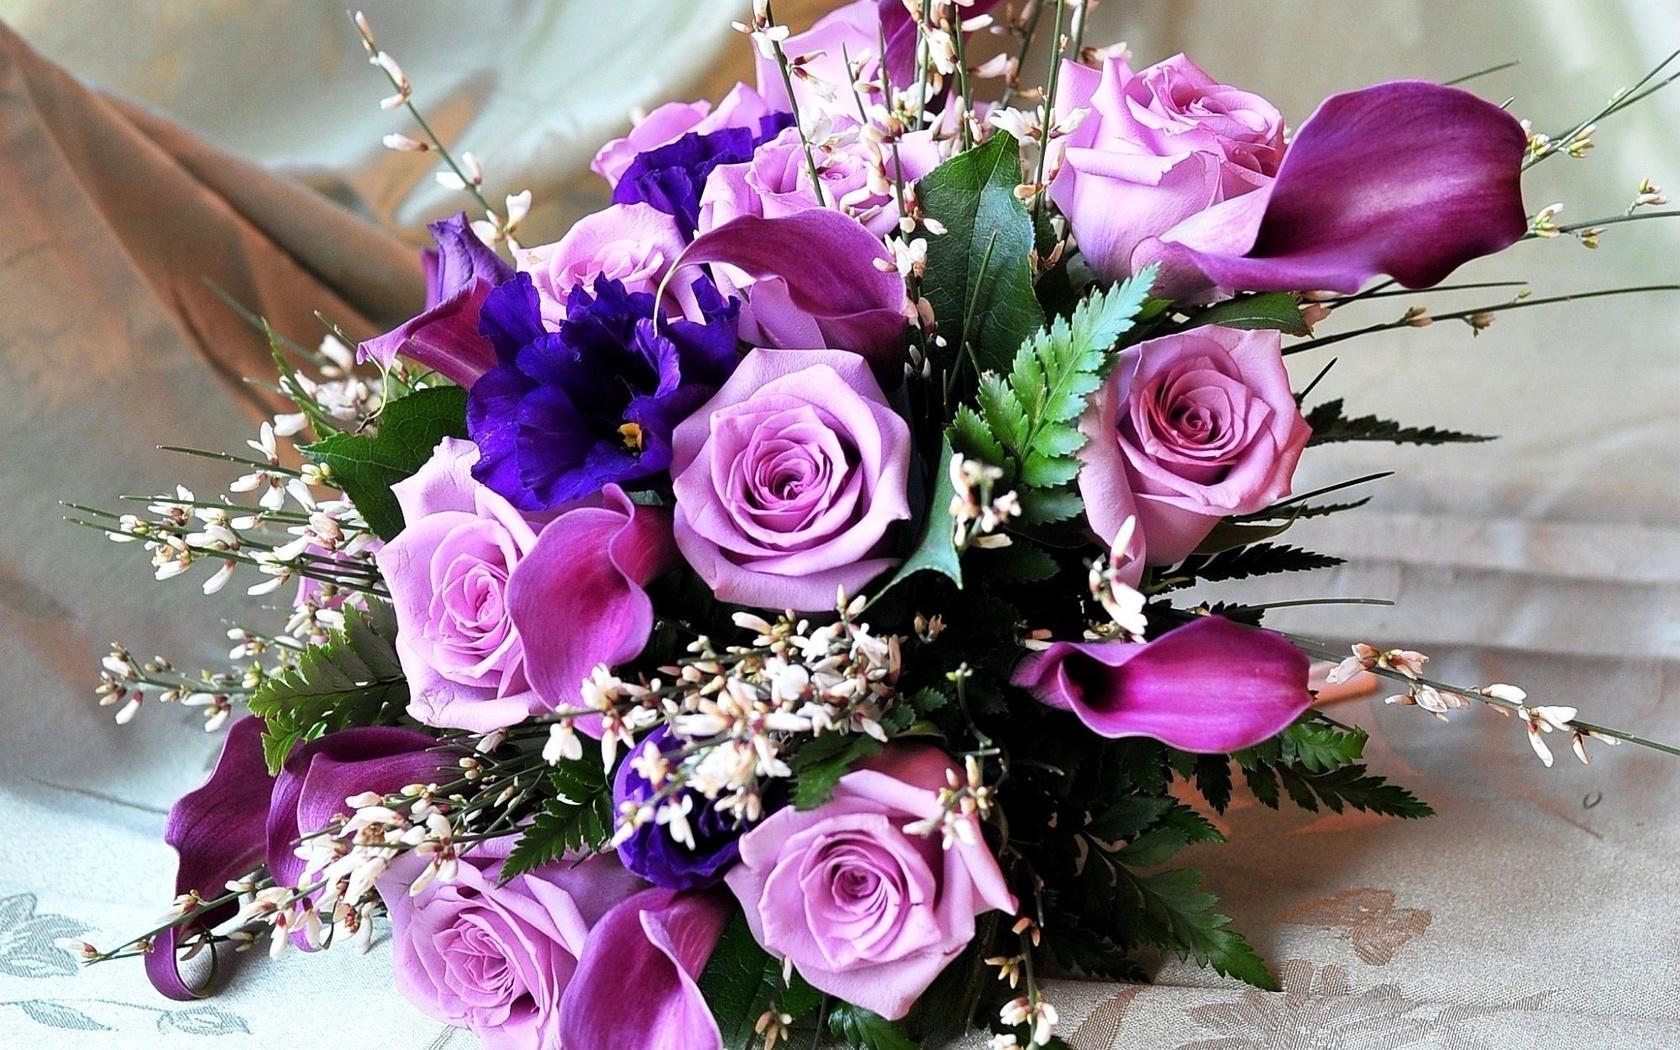 Открытки букет цветы, коллеге